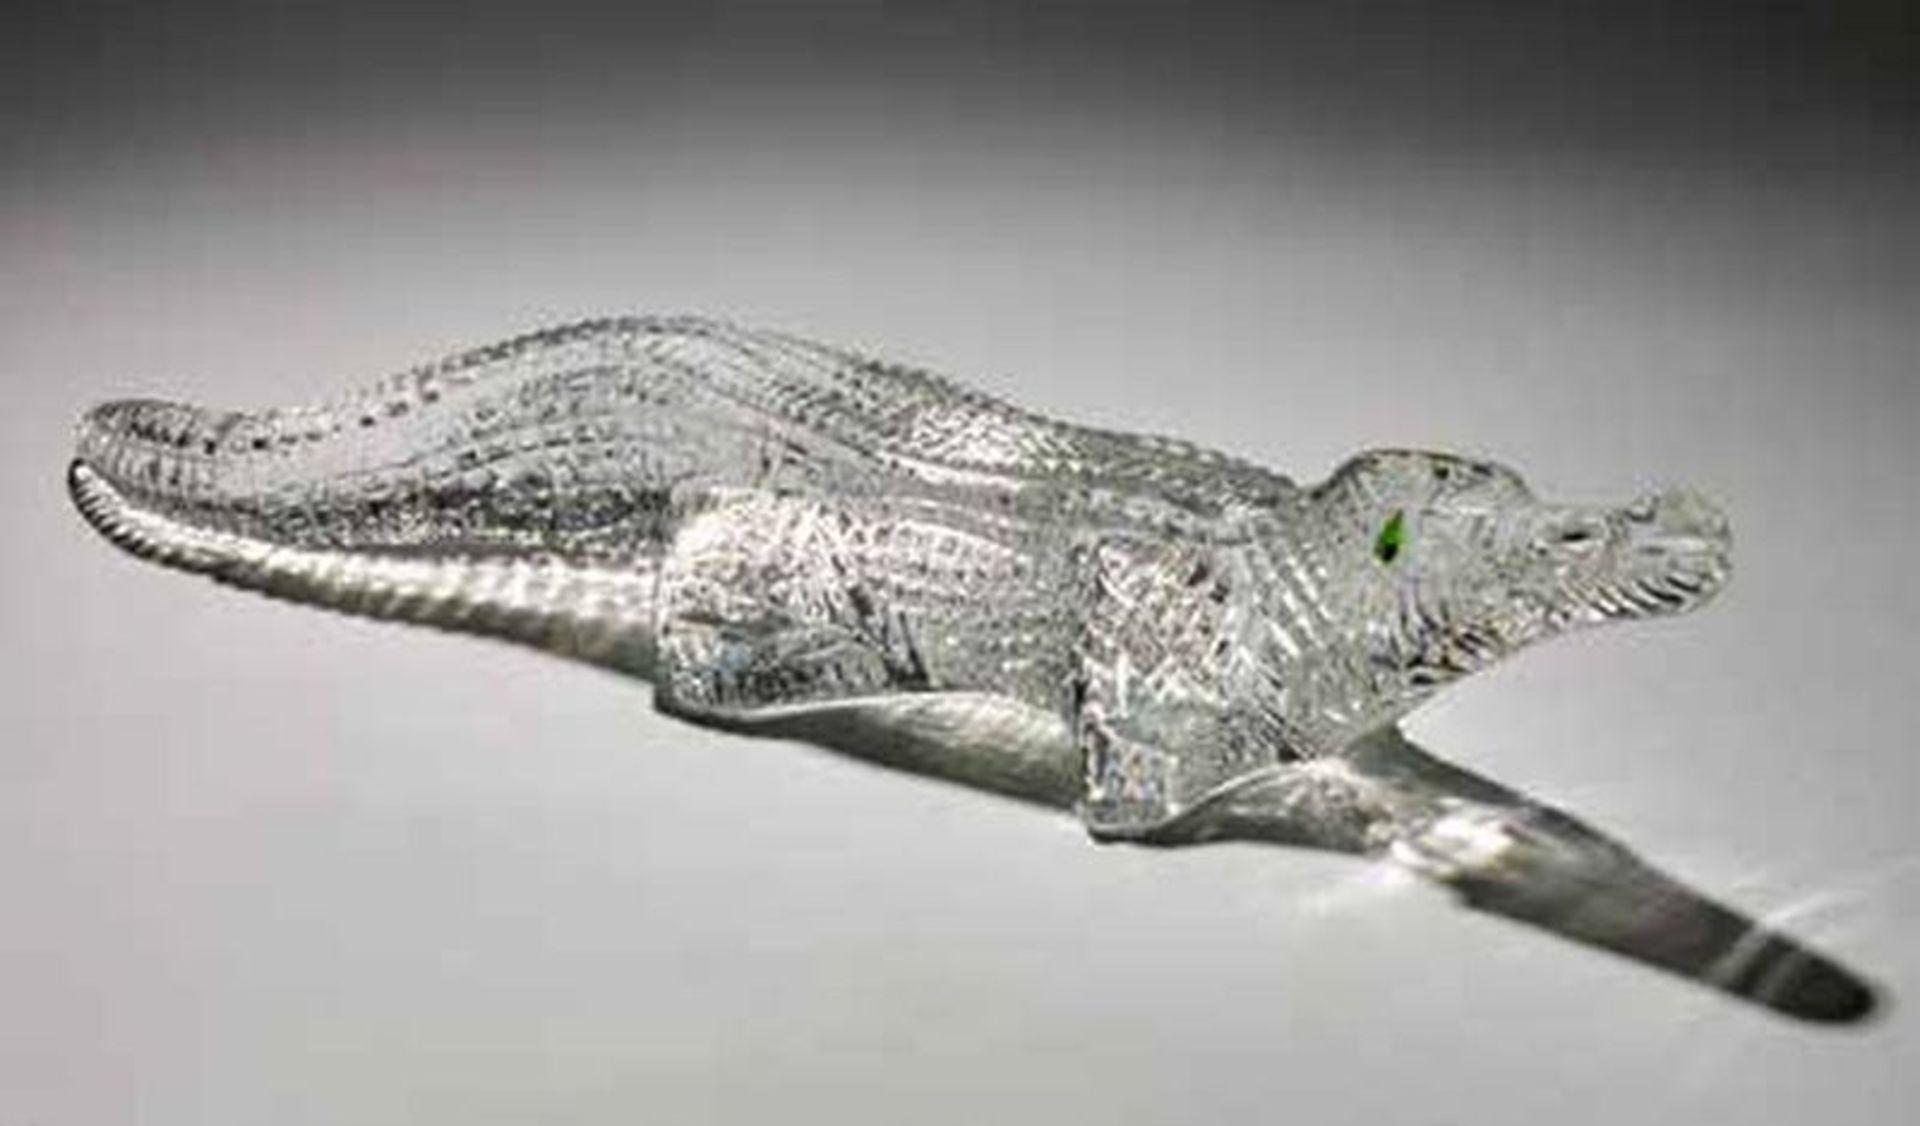 BACCARAT CROCODILE - Crystal crocodile shedding one green crocodile tear, extremely [...]